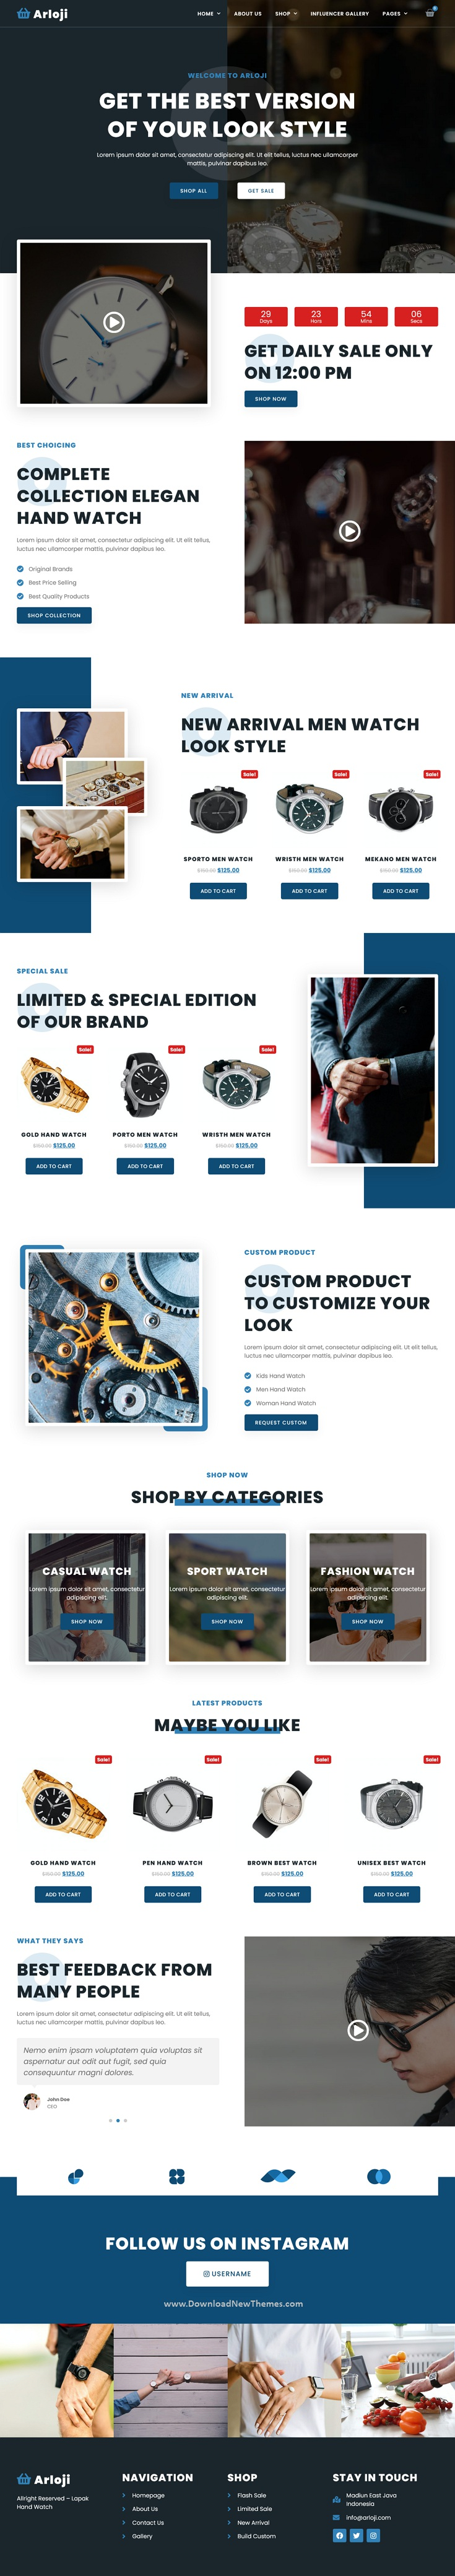 Arloji - Modern Hand Watch Shop eCommerce Elementor Template Kit